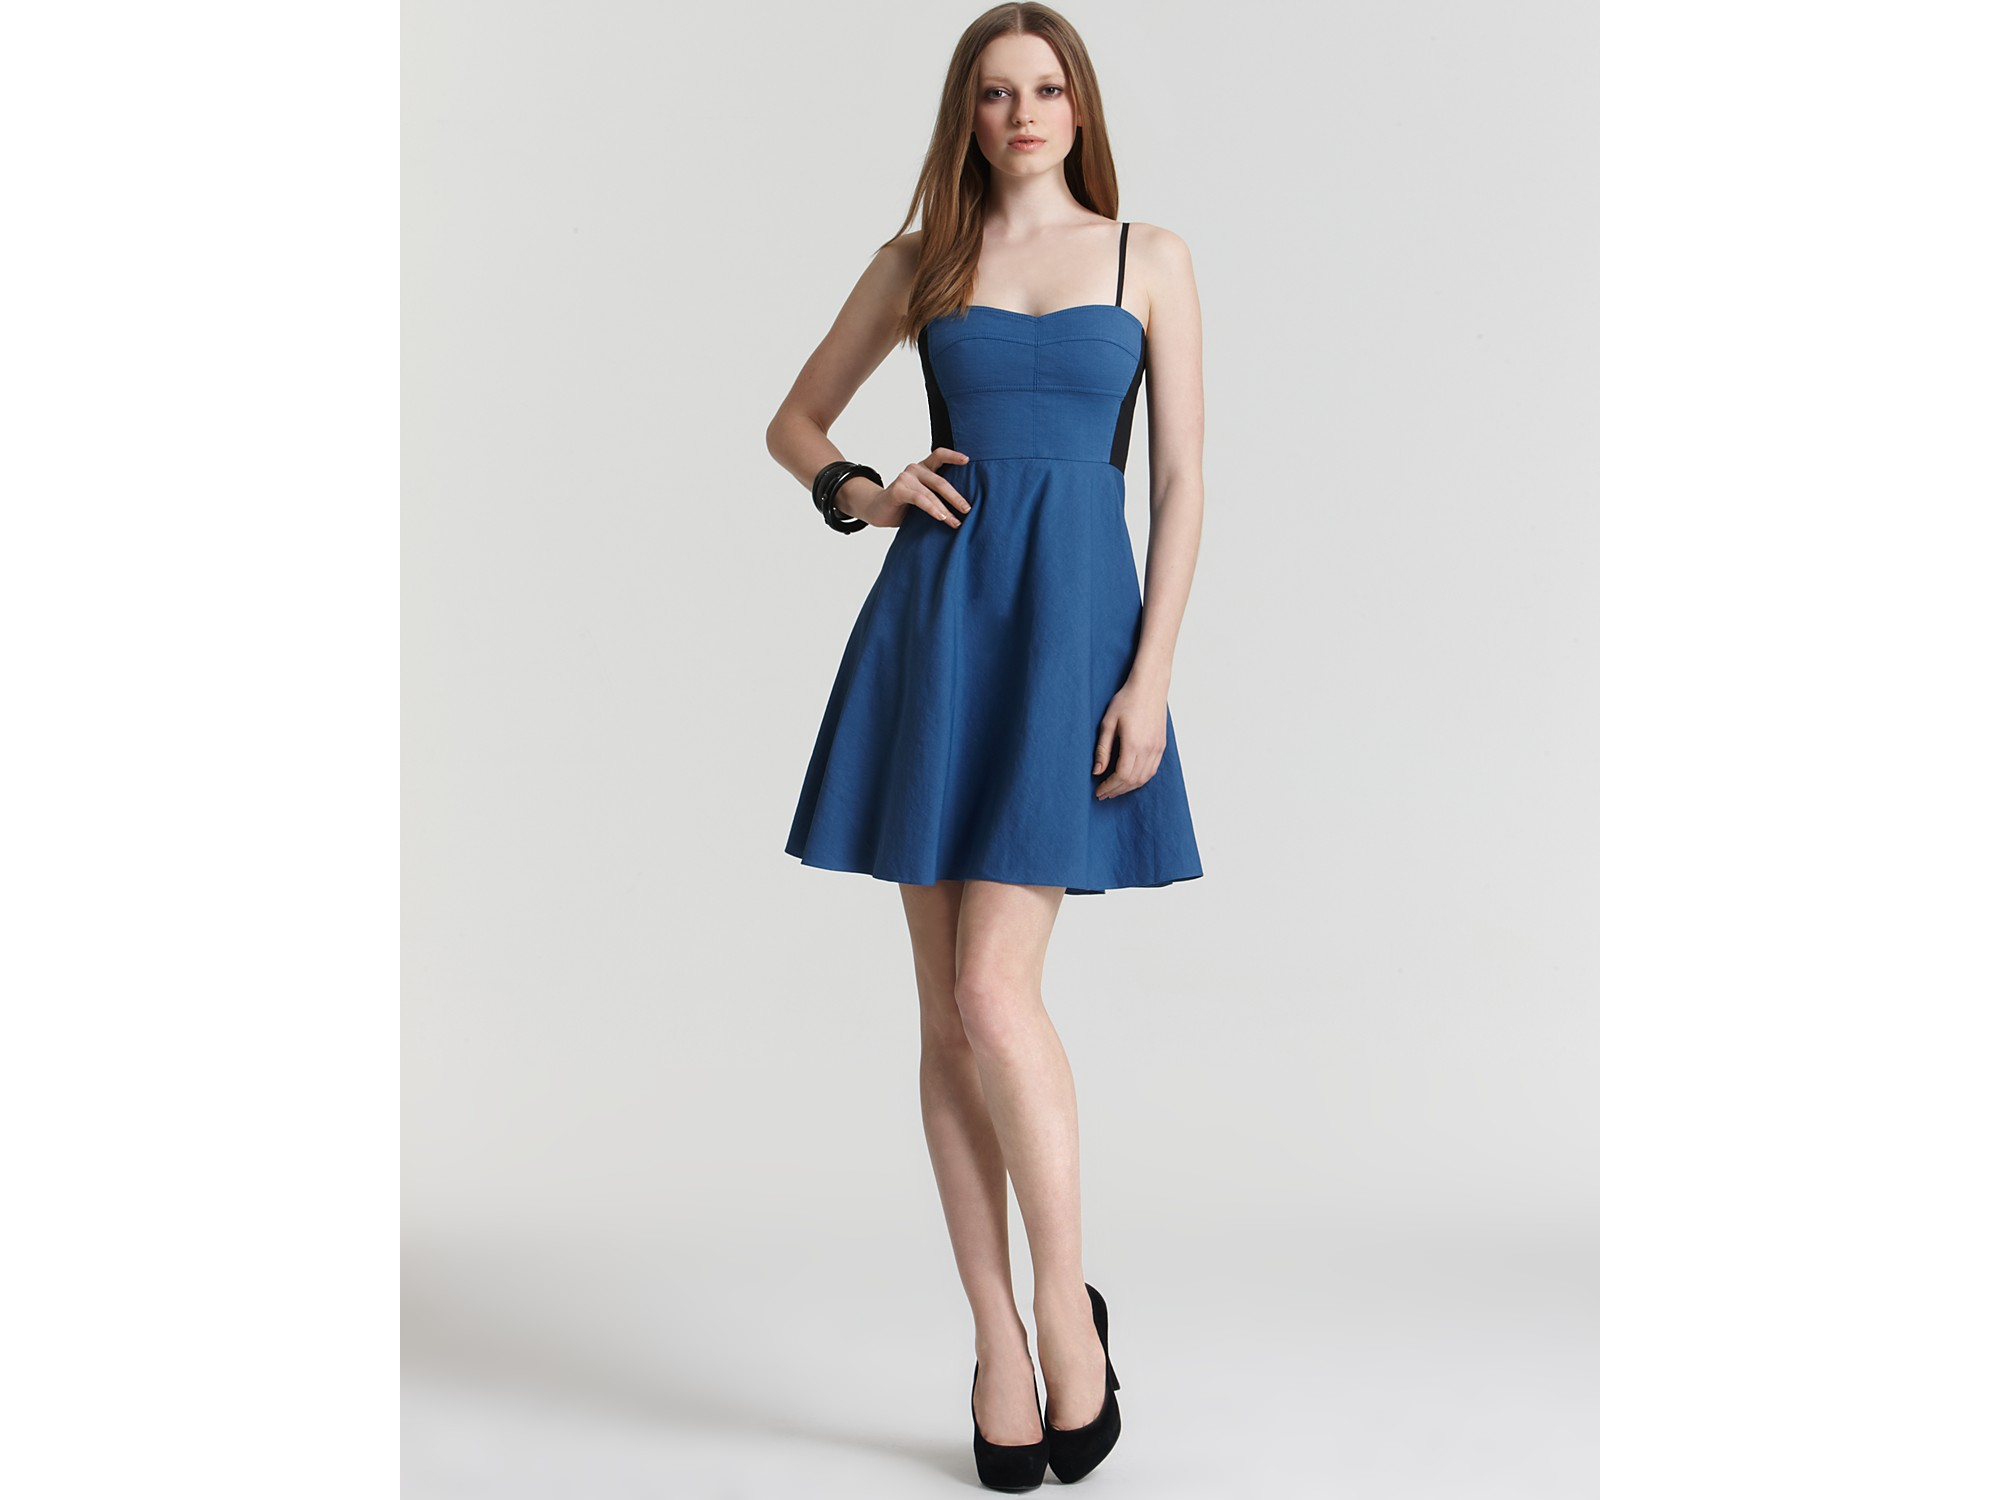 9bbefd9b043 NEW DKNY Denim Blue Spaghetti Strap Color Block Fit   Flare ...